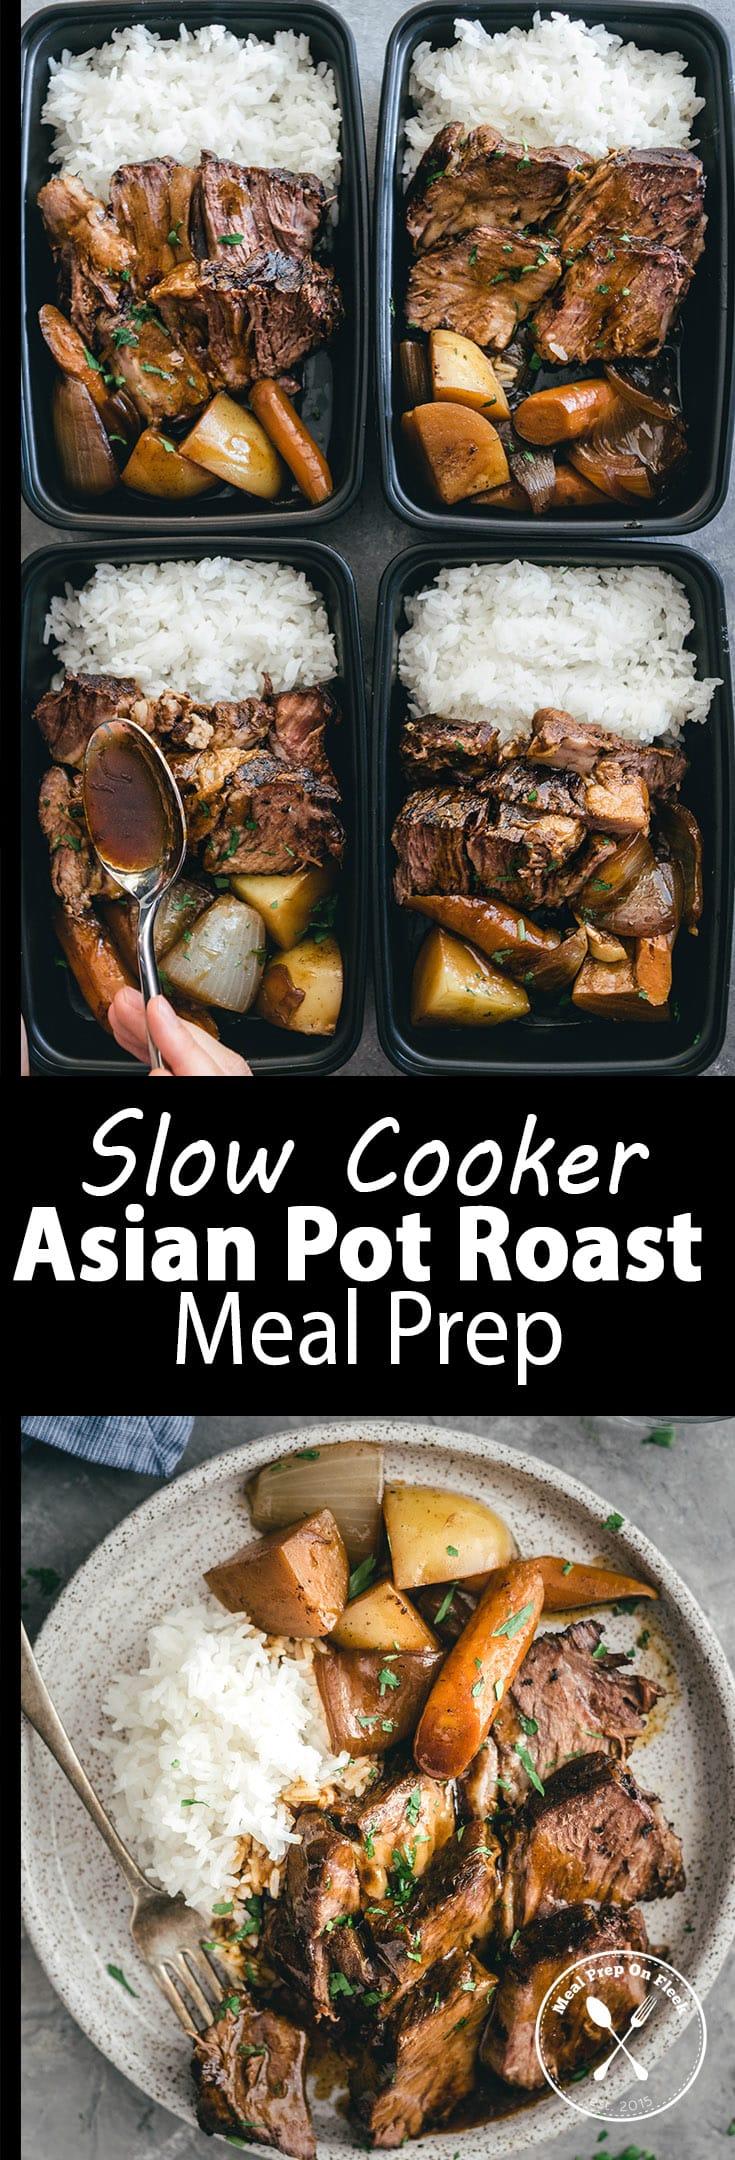 Slow Cooker Asian Pot Roast Meal Prep Recipe